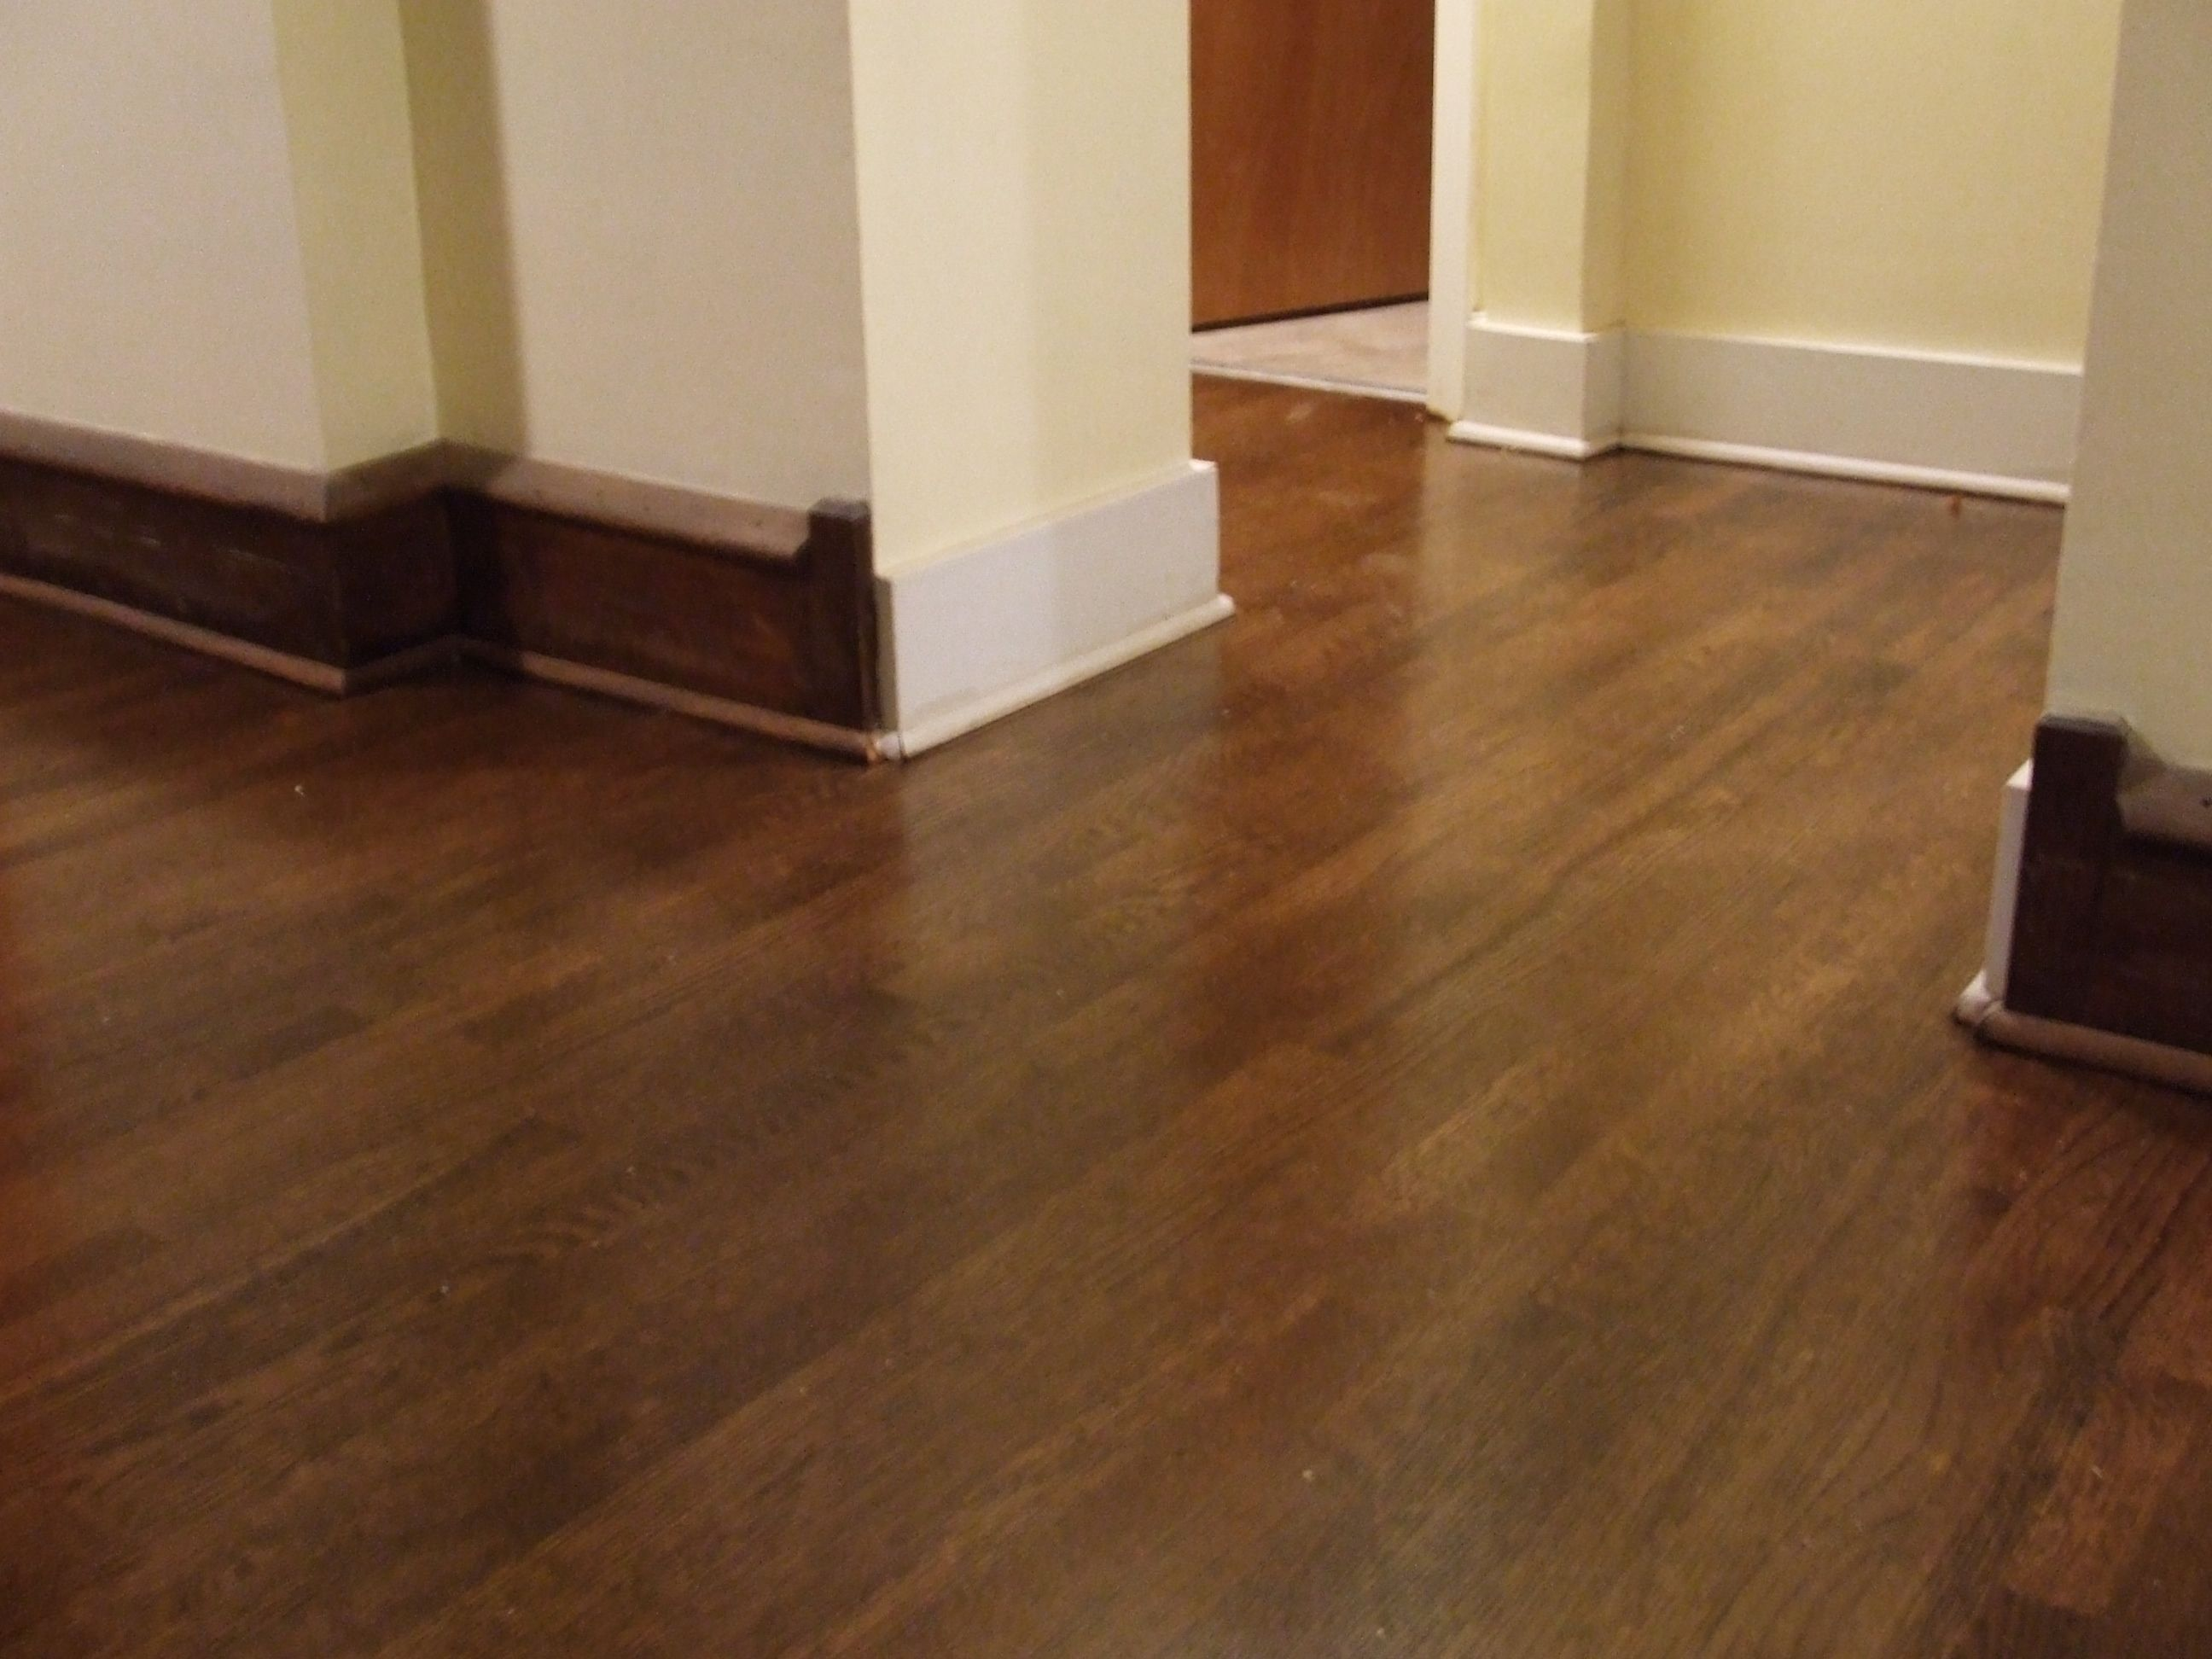 Using Wood Base Makes It Look Old Fashioned Reclaimed Hardwood Flooring Floor Refinishing